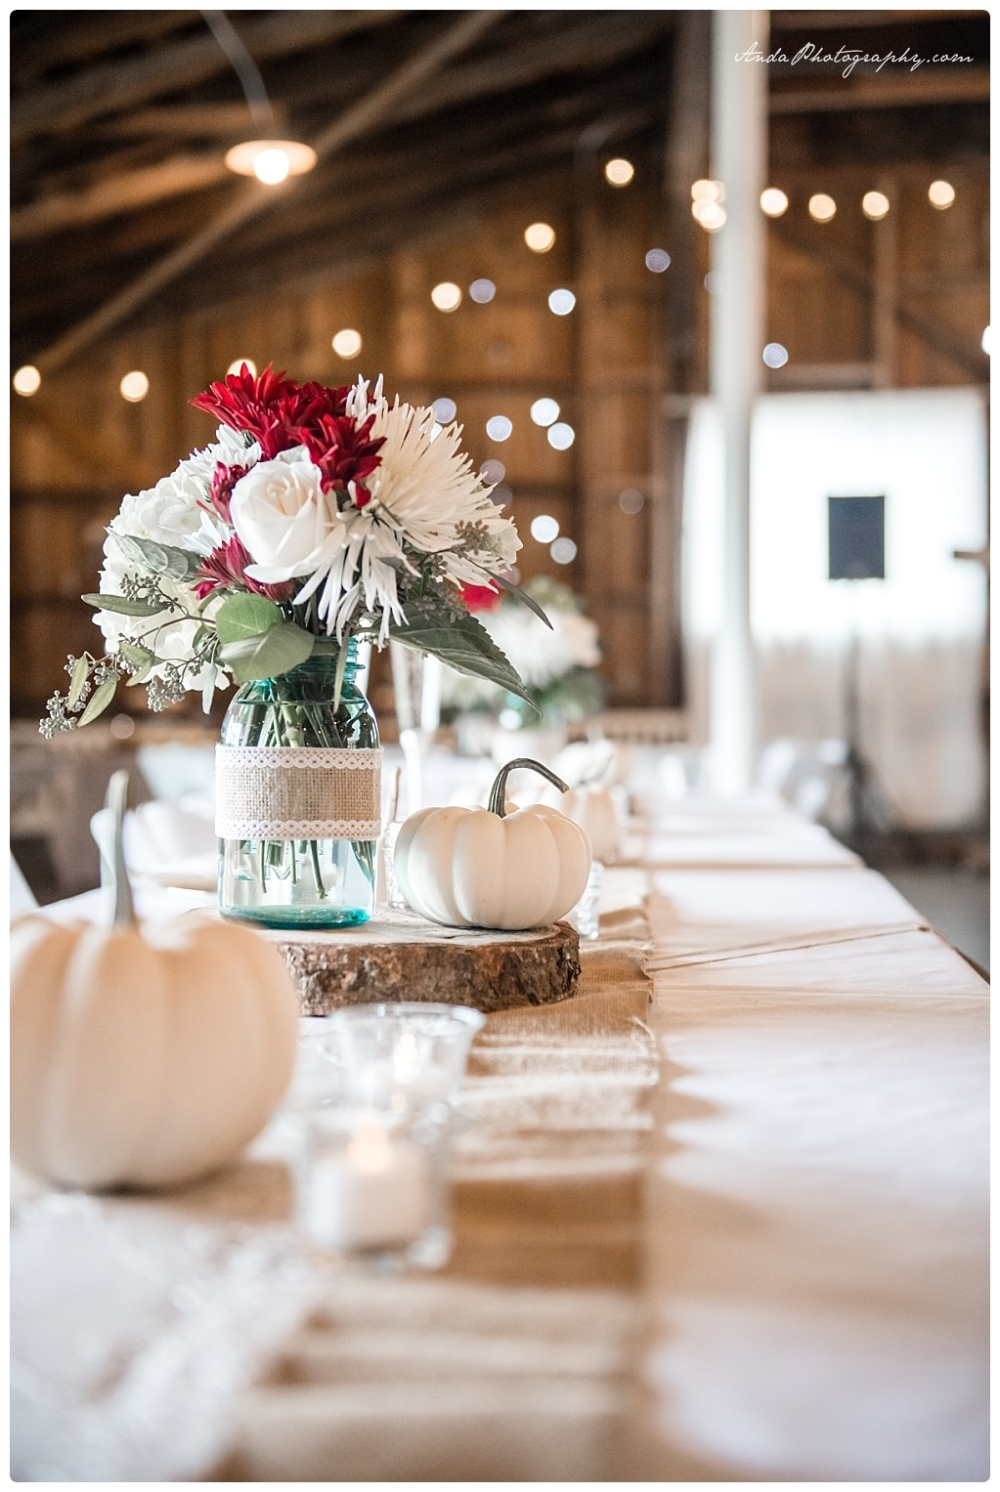 Anda Photography Bellingham wedding photography Bellingham lifestyle wedding photographer Maplehurst Farms_0018